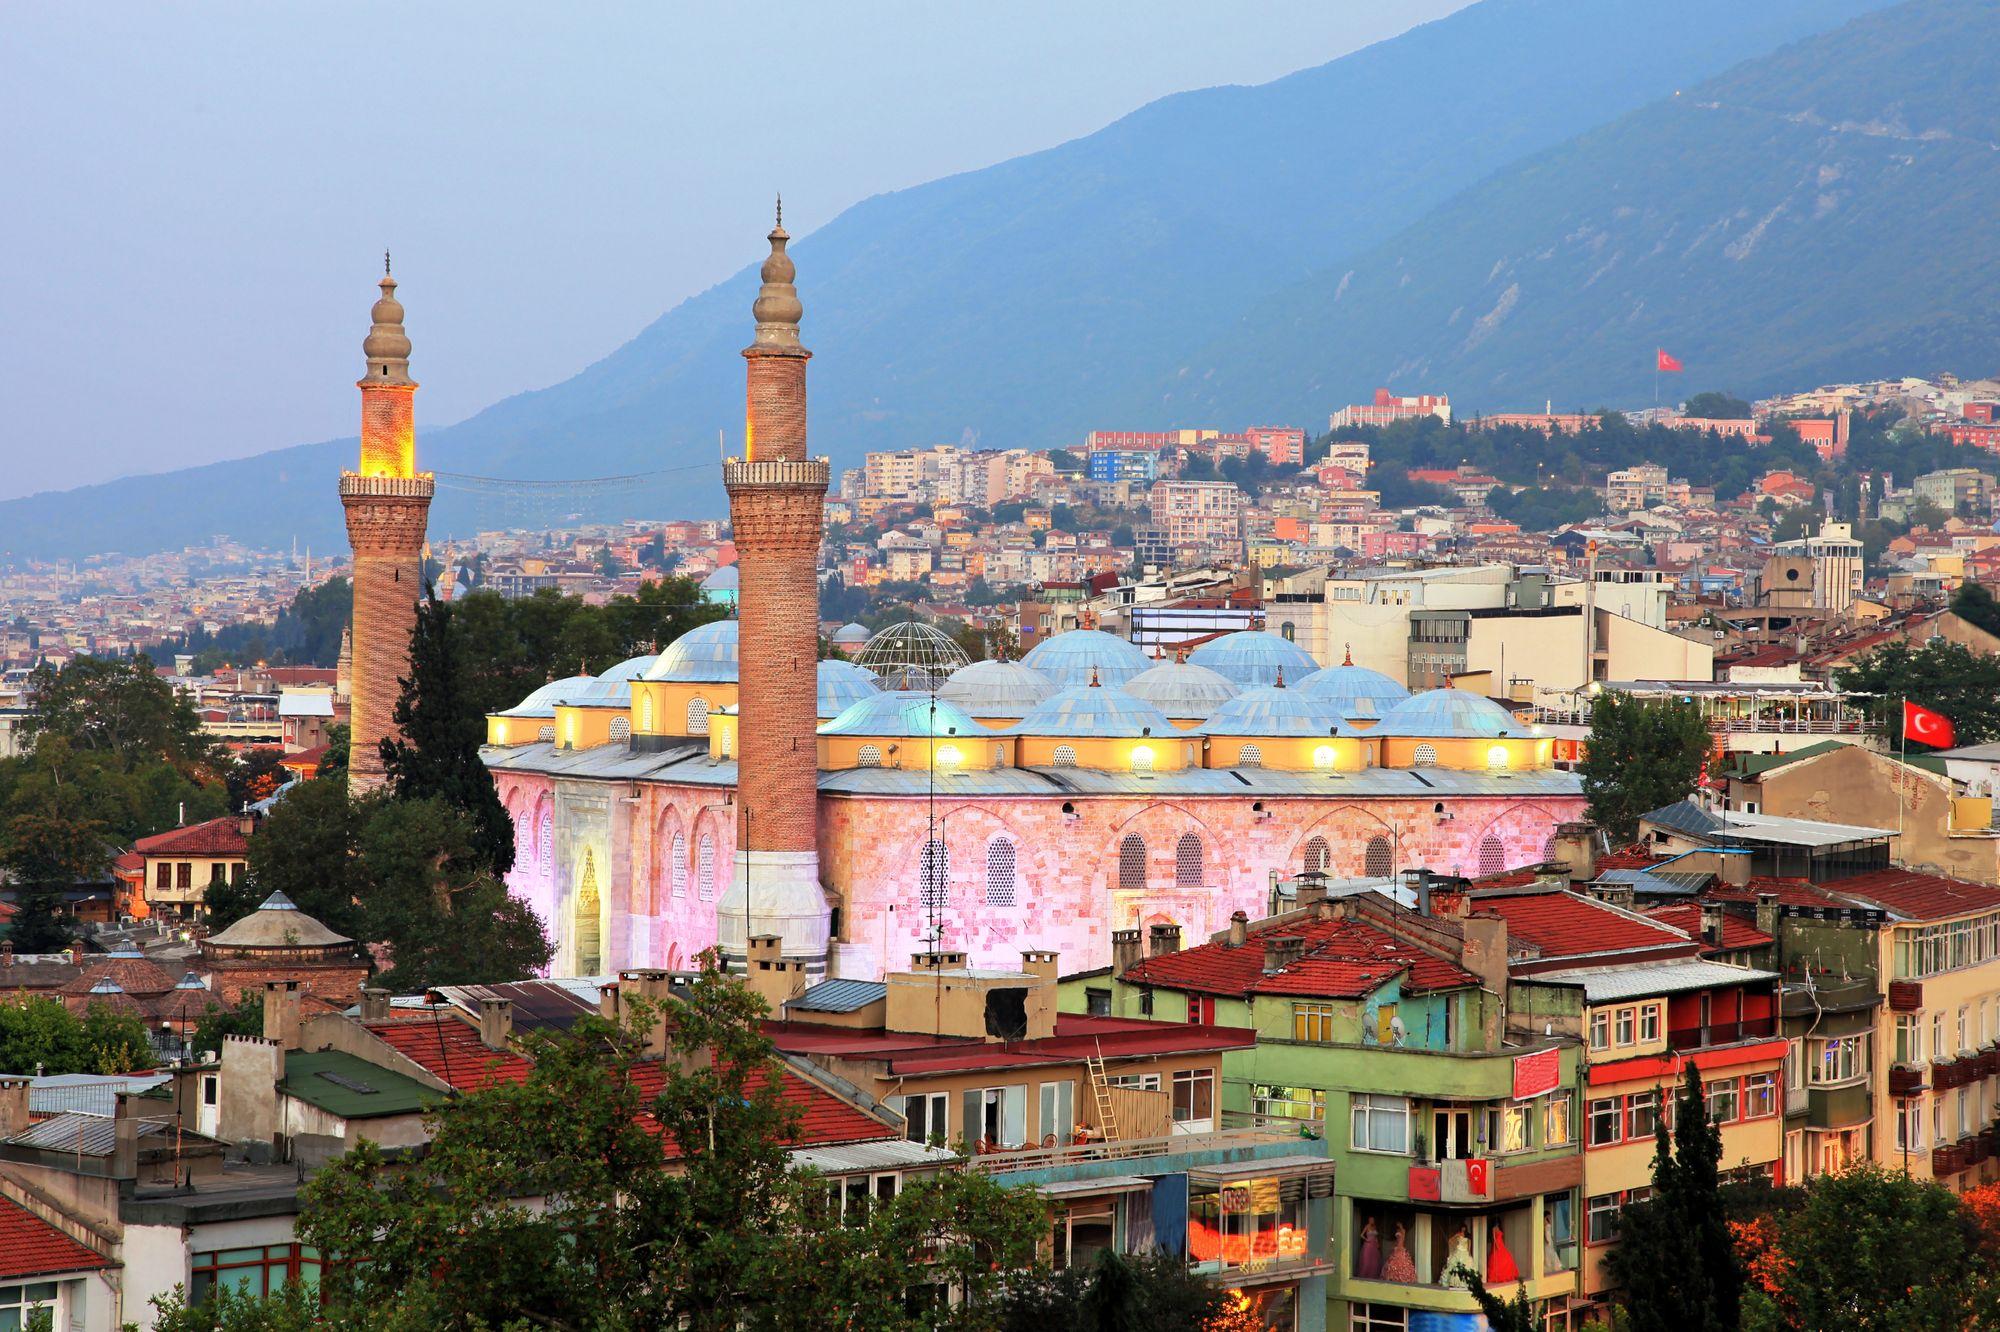 Bursa's Grand Mosque